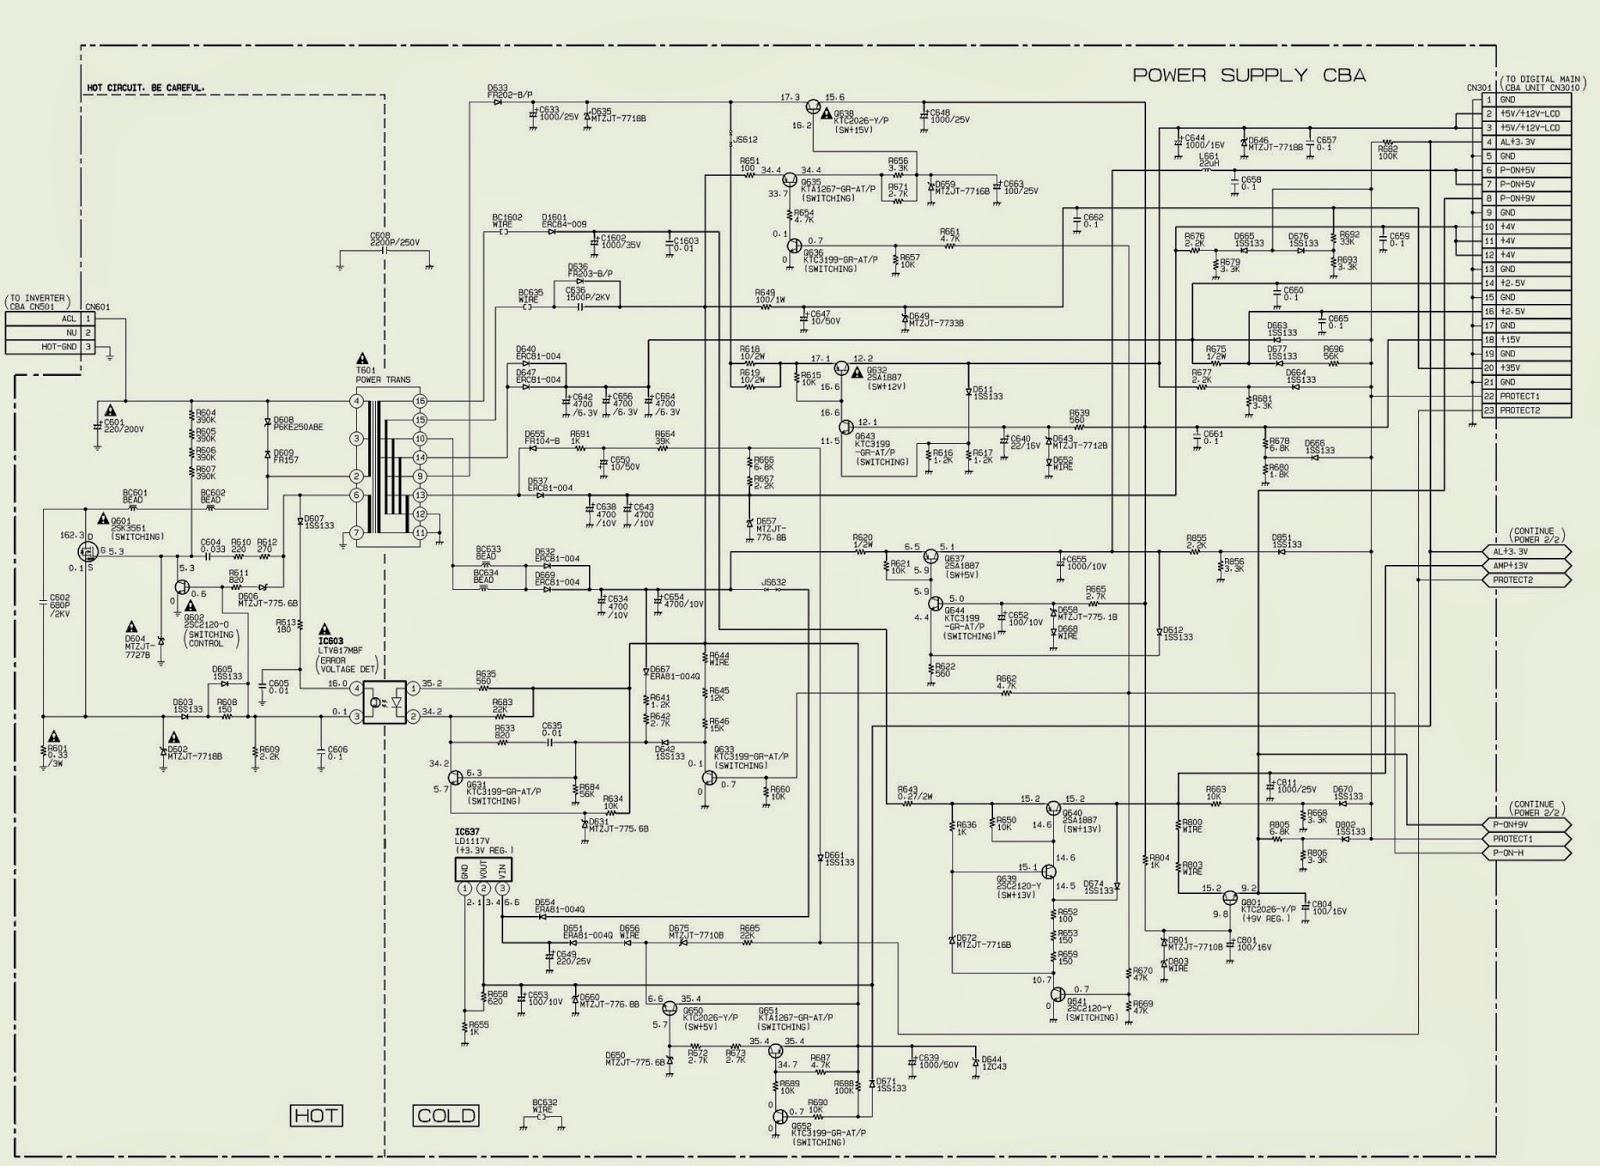 Eico 460 Oscilloscope service Manual